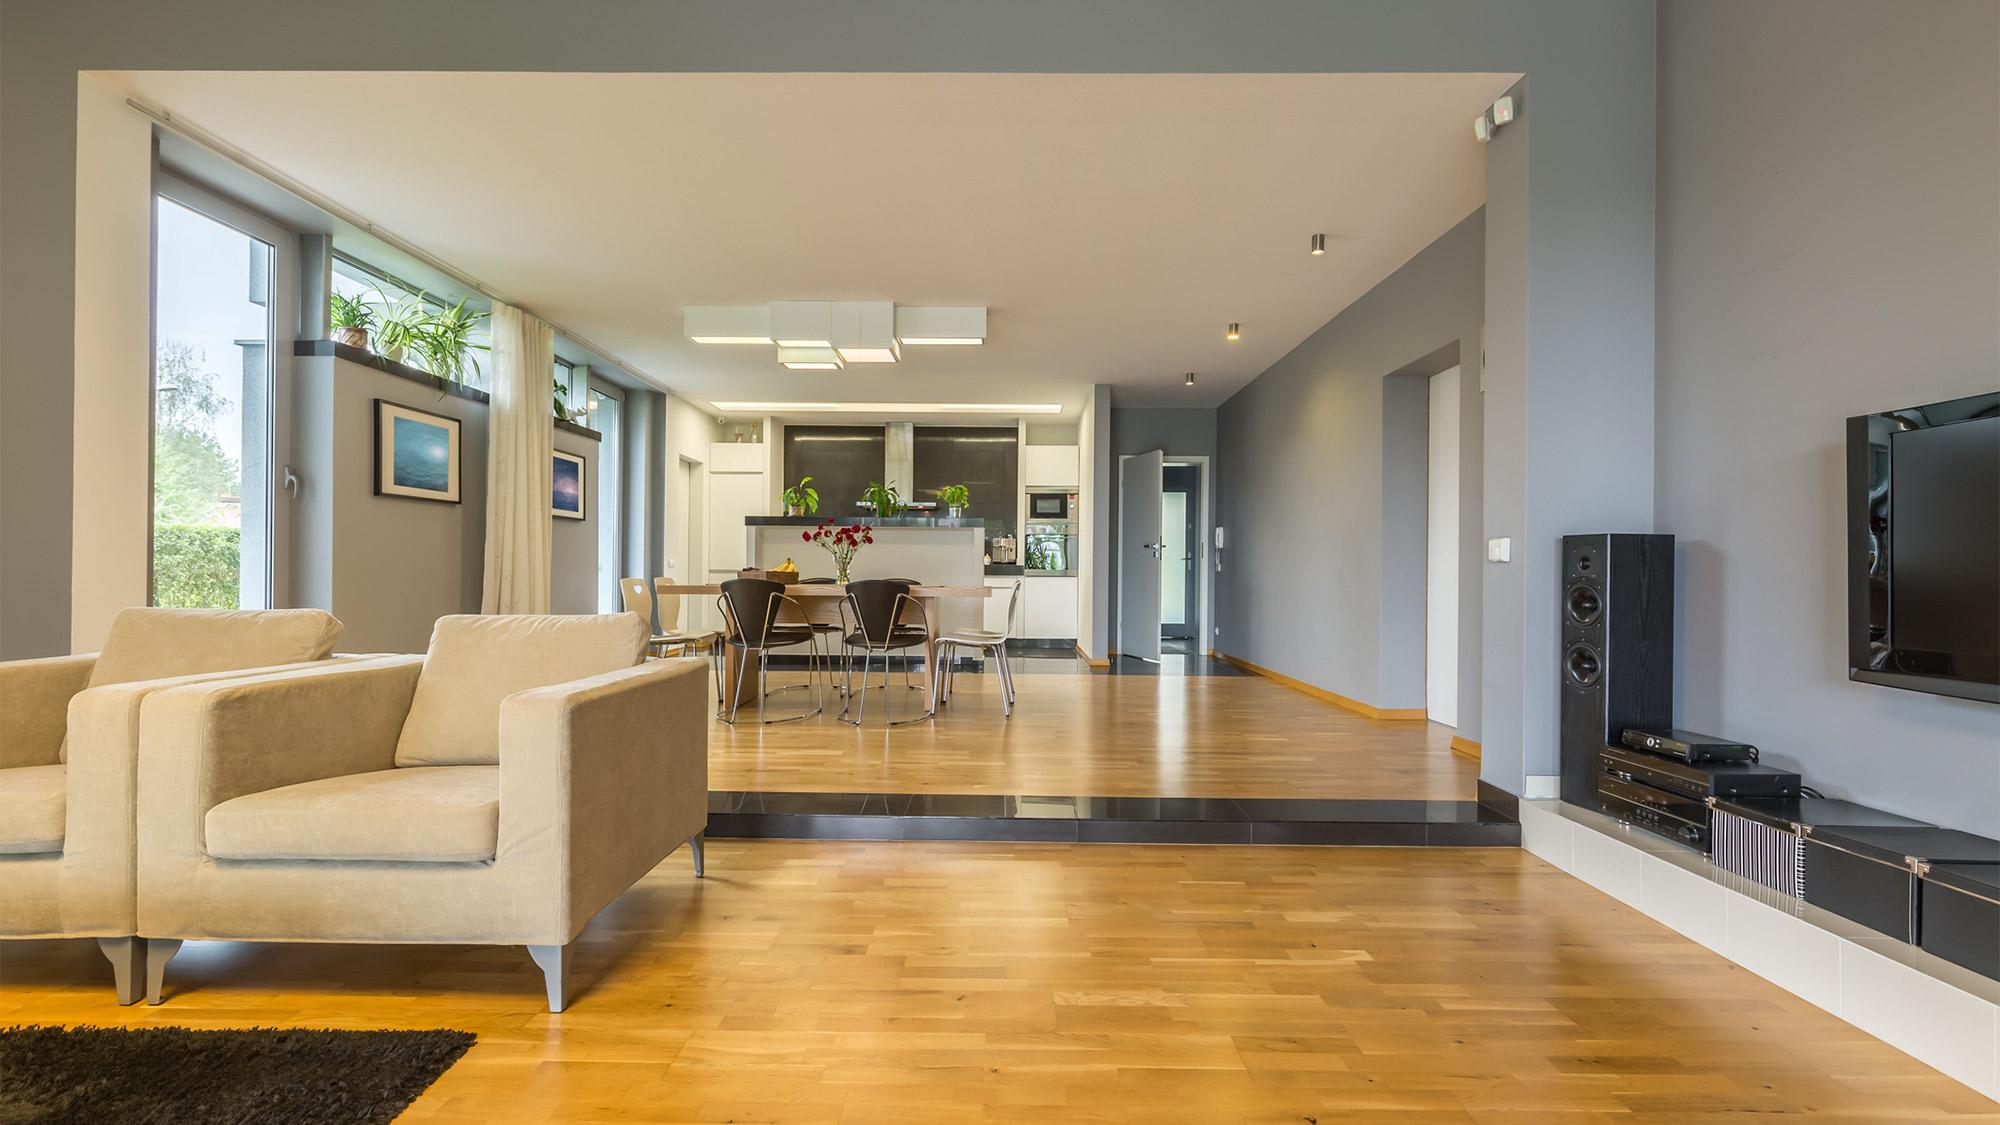 An interior with an open floor plan